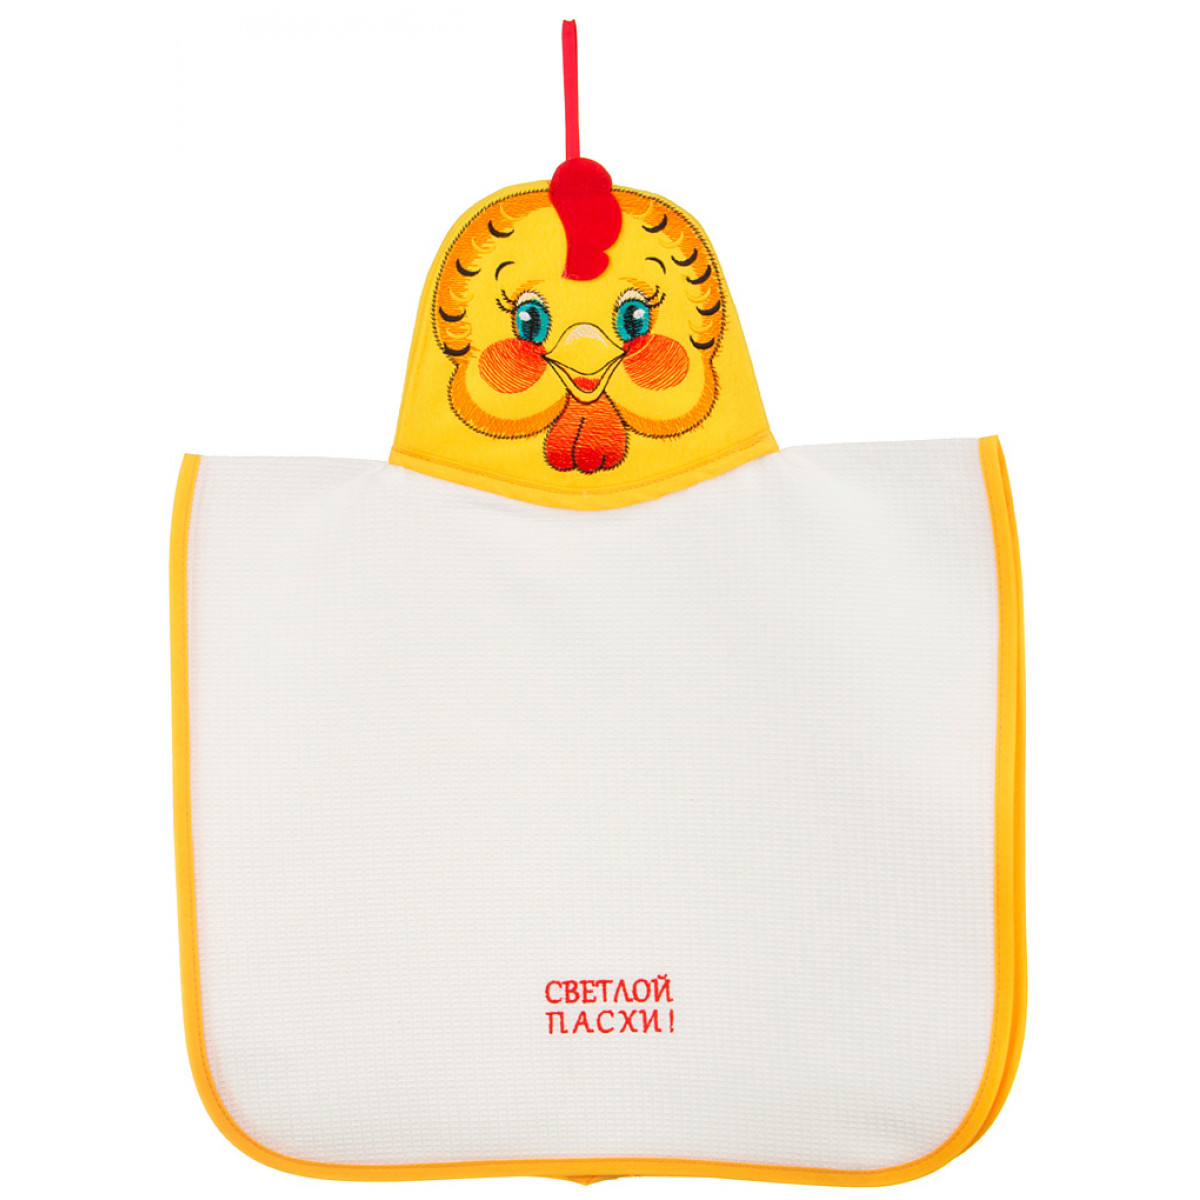 {} Santalino Кухонное полотенце Riley  (40х70 см) полотенца santalino полотенце shulamite 40х70 см